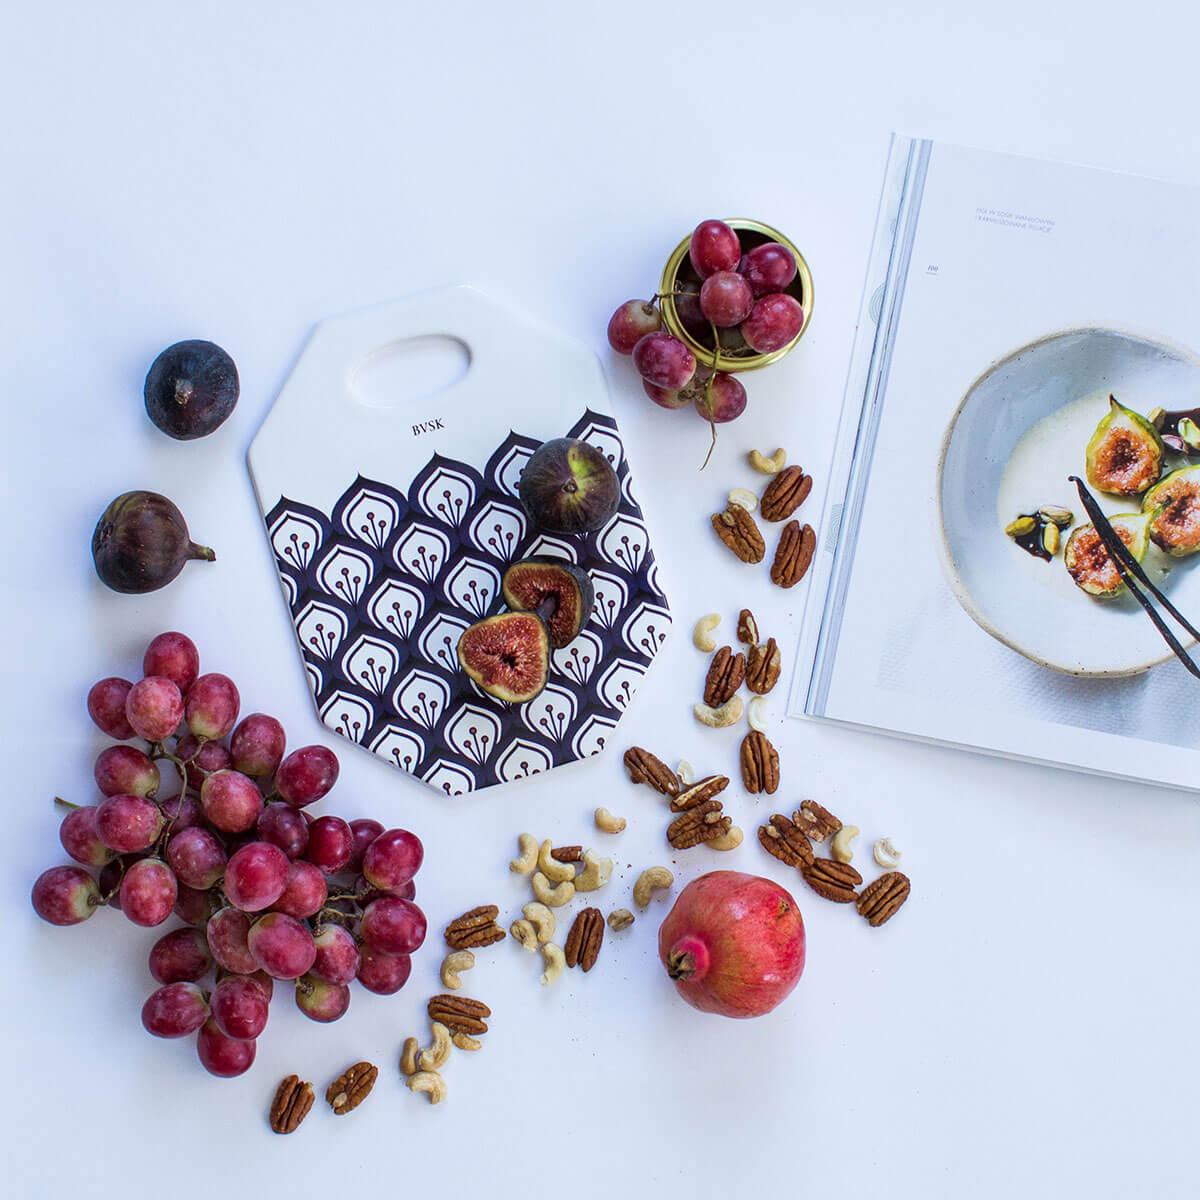 Taszkent – Deska Ceramiaczna BVSA – Kolekcja AW17 Cookbook Lookbook